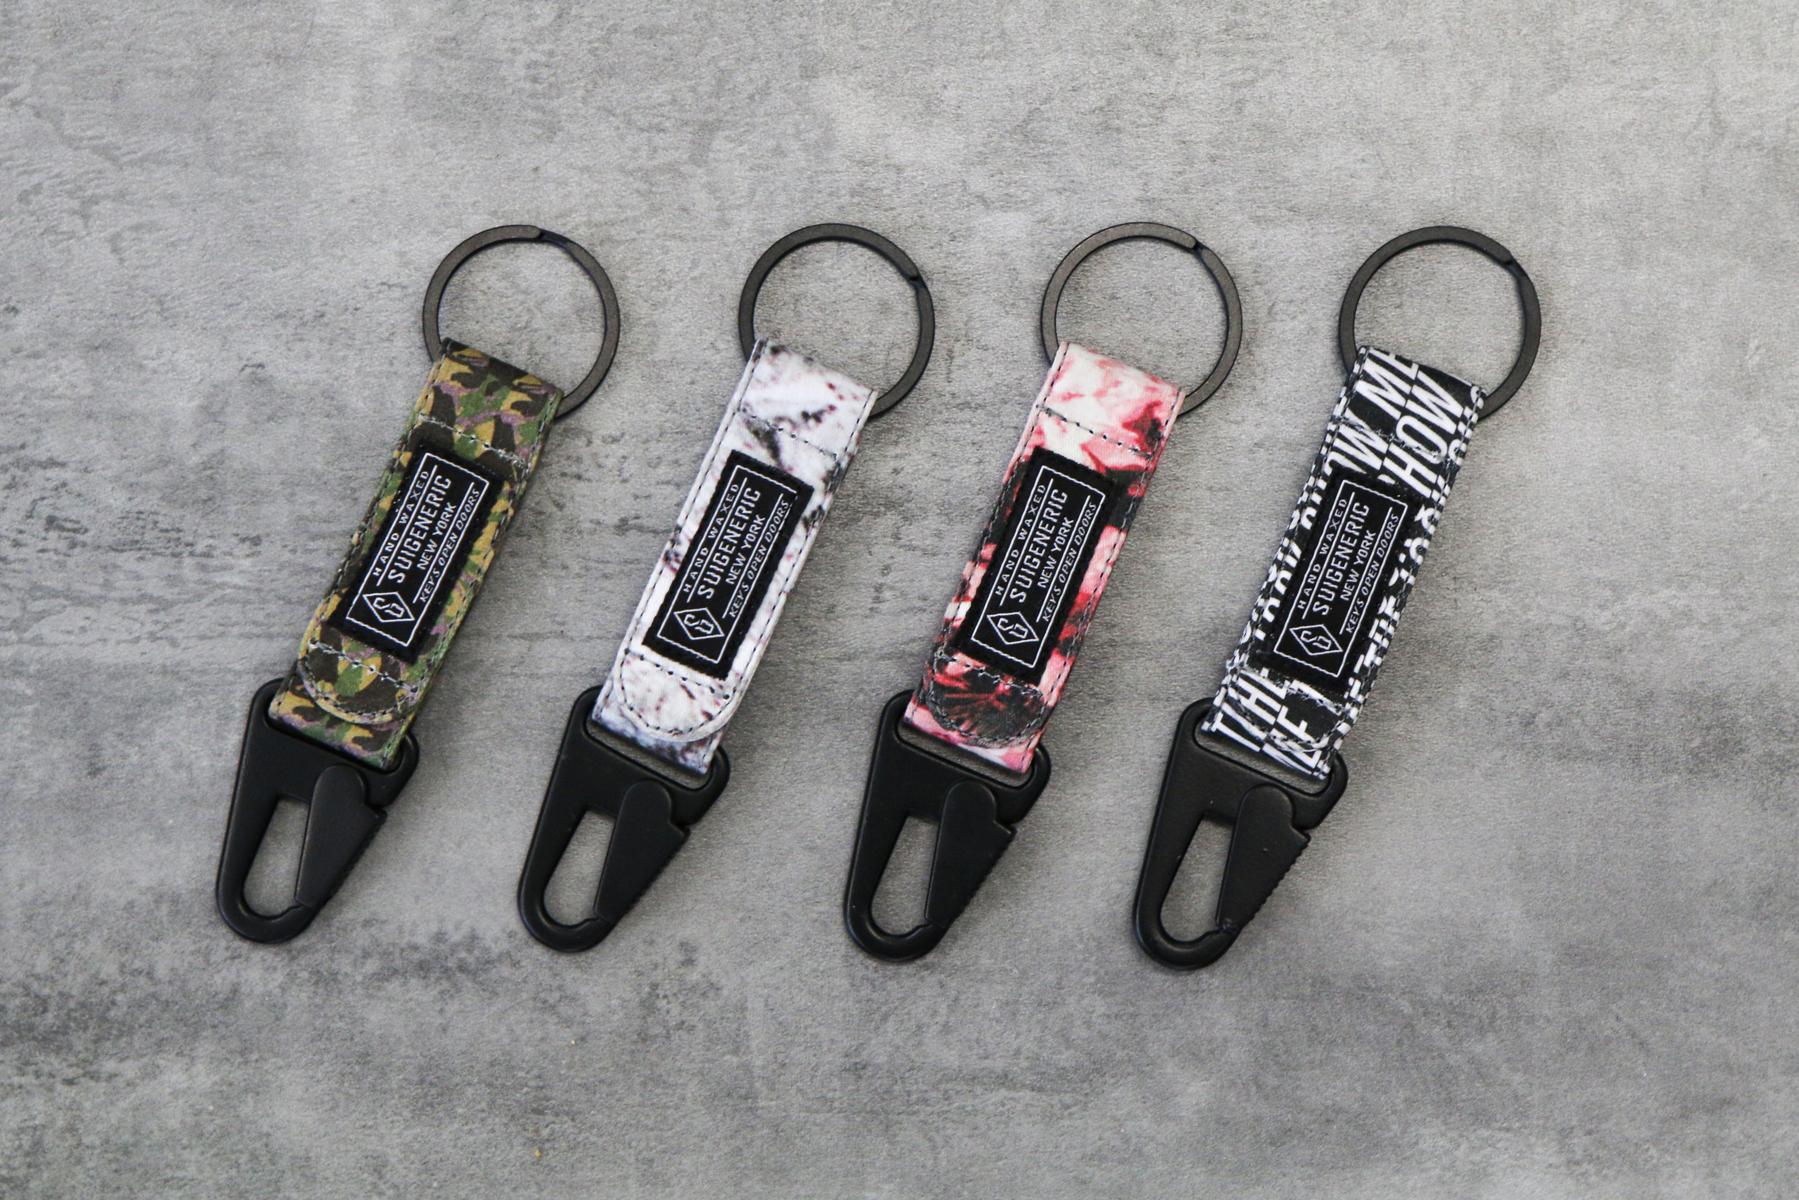 Suigeneric 2014 Hand-Waxed Keychains